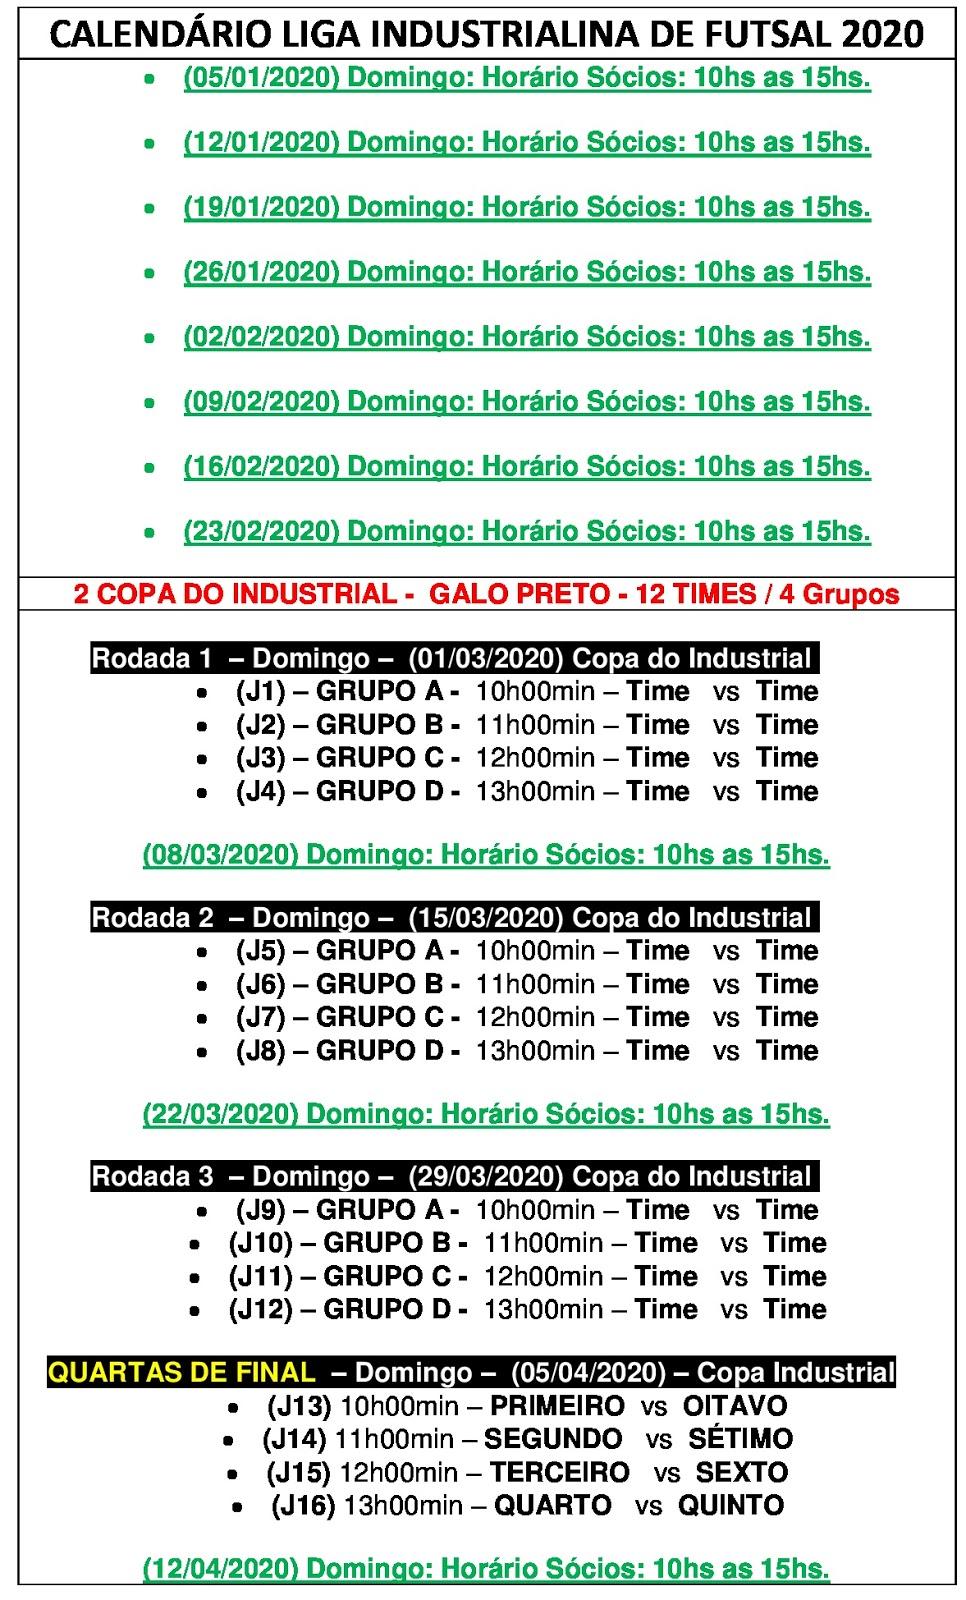 Calendario 2020 Liga.Liga Industrialina Futsal Calendario 2020